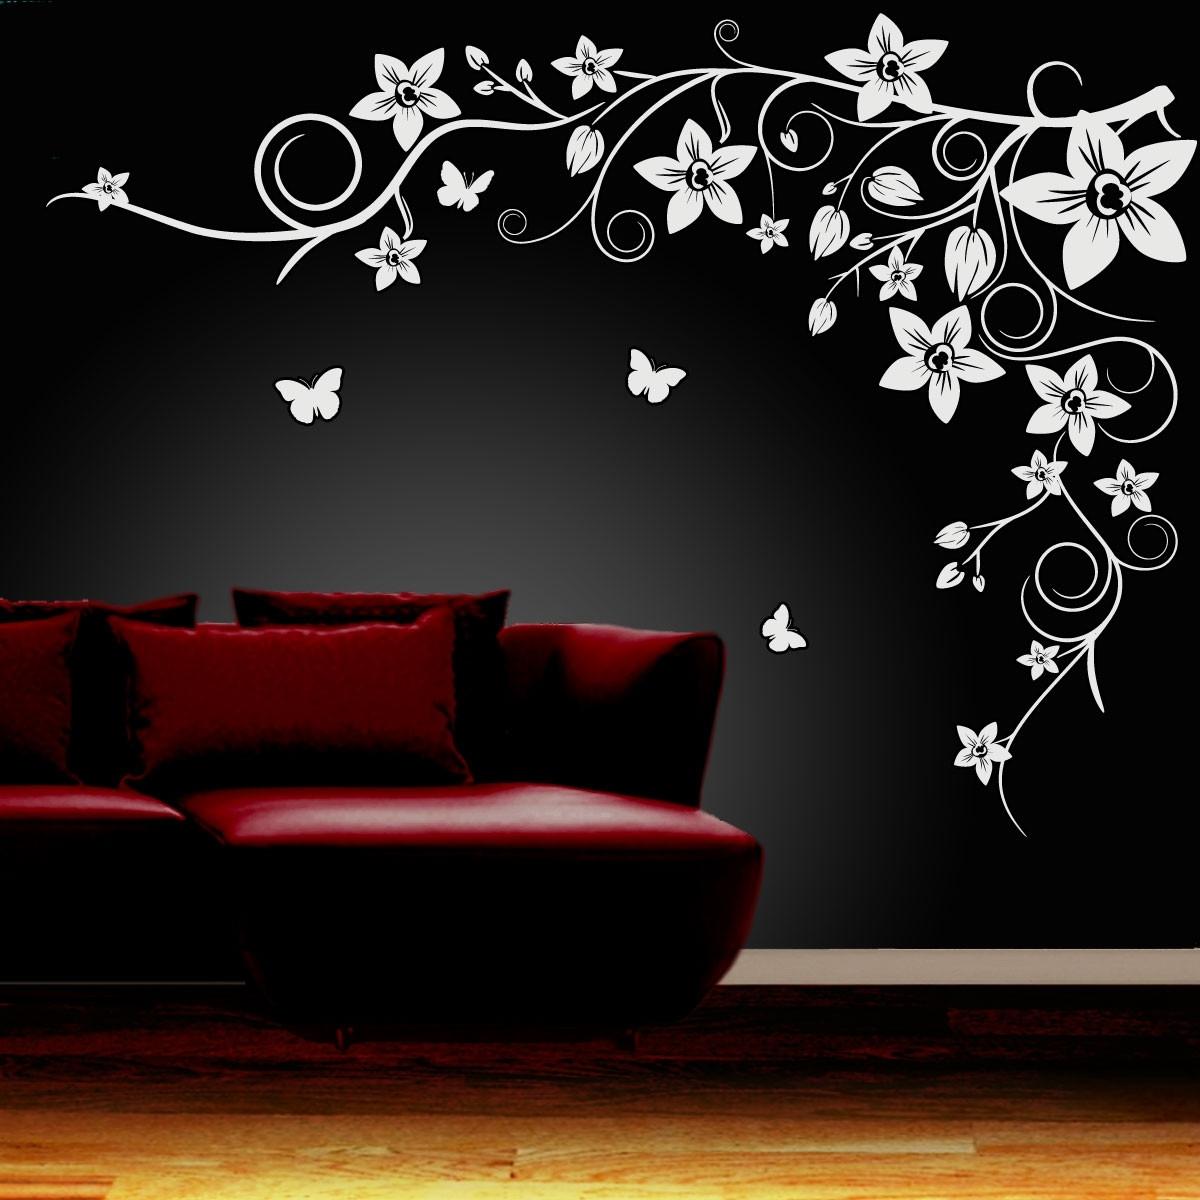 Flower Wall Art With Most Popular Wall Decor Flowers Best Of Wall Art Ideas Design Black Flower Wall (View 8 of 15)